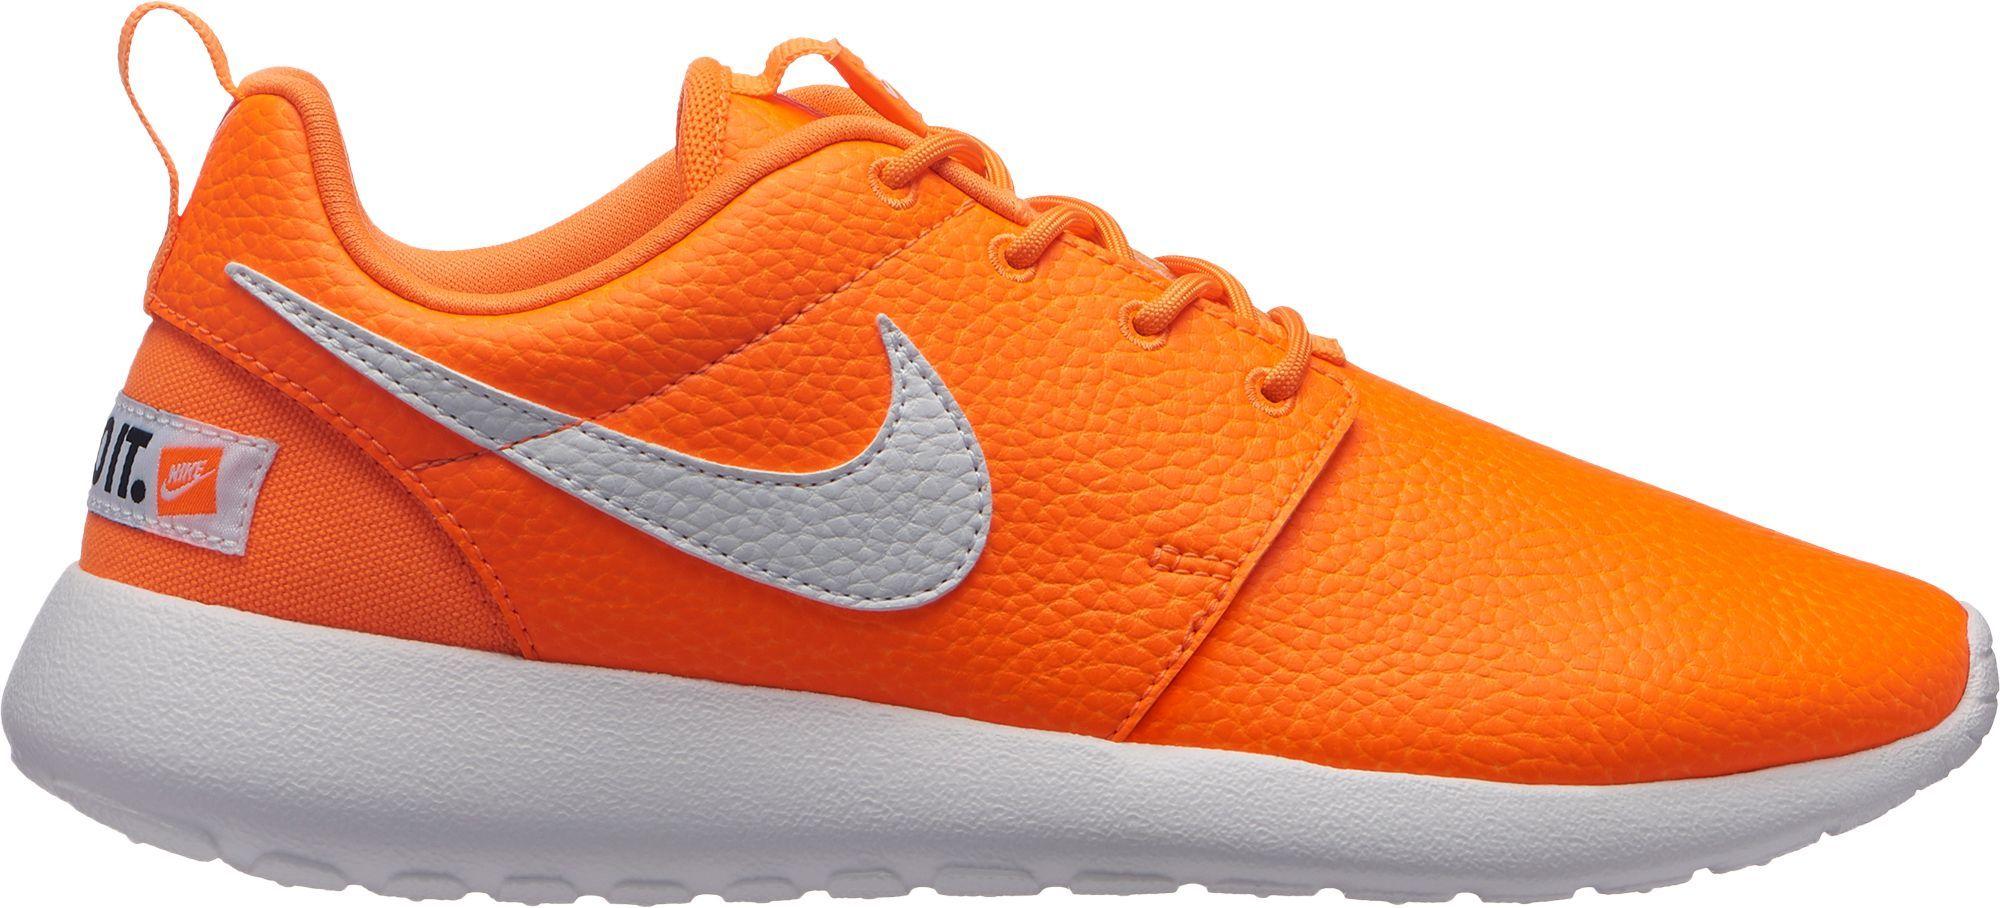 Nike Women's Roshe One Premium Just Do It Shoes, Orange